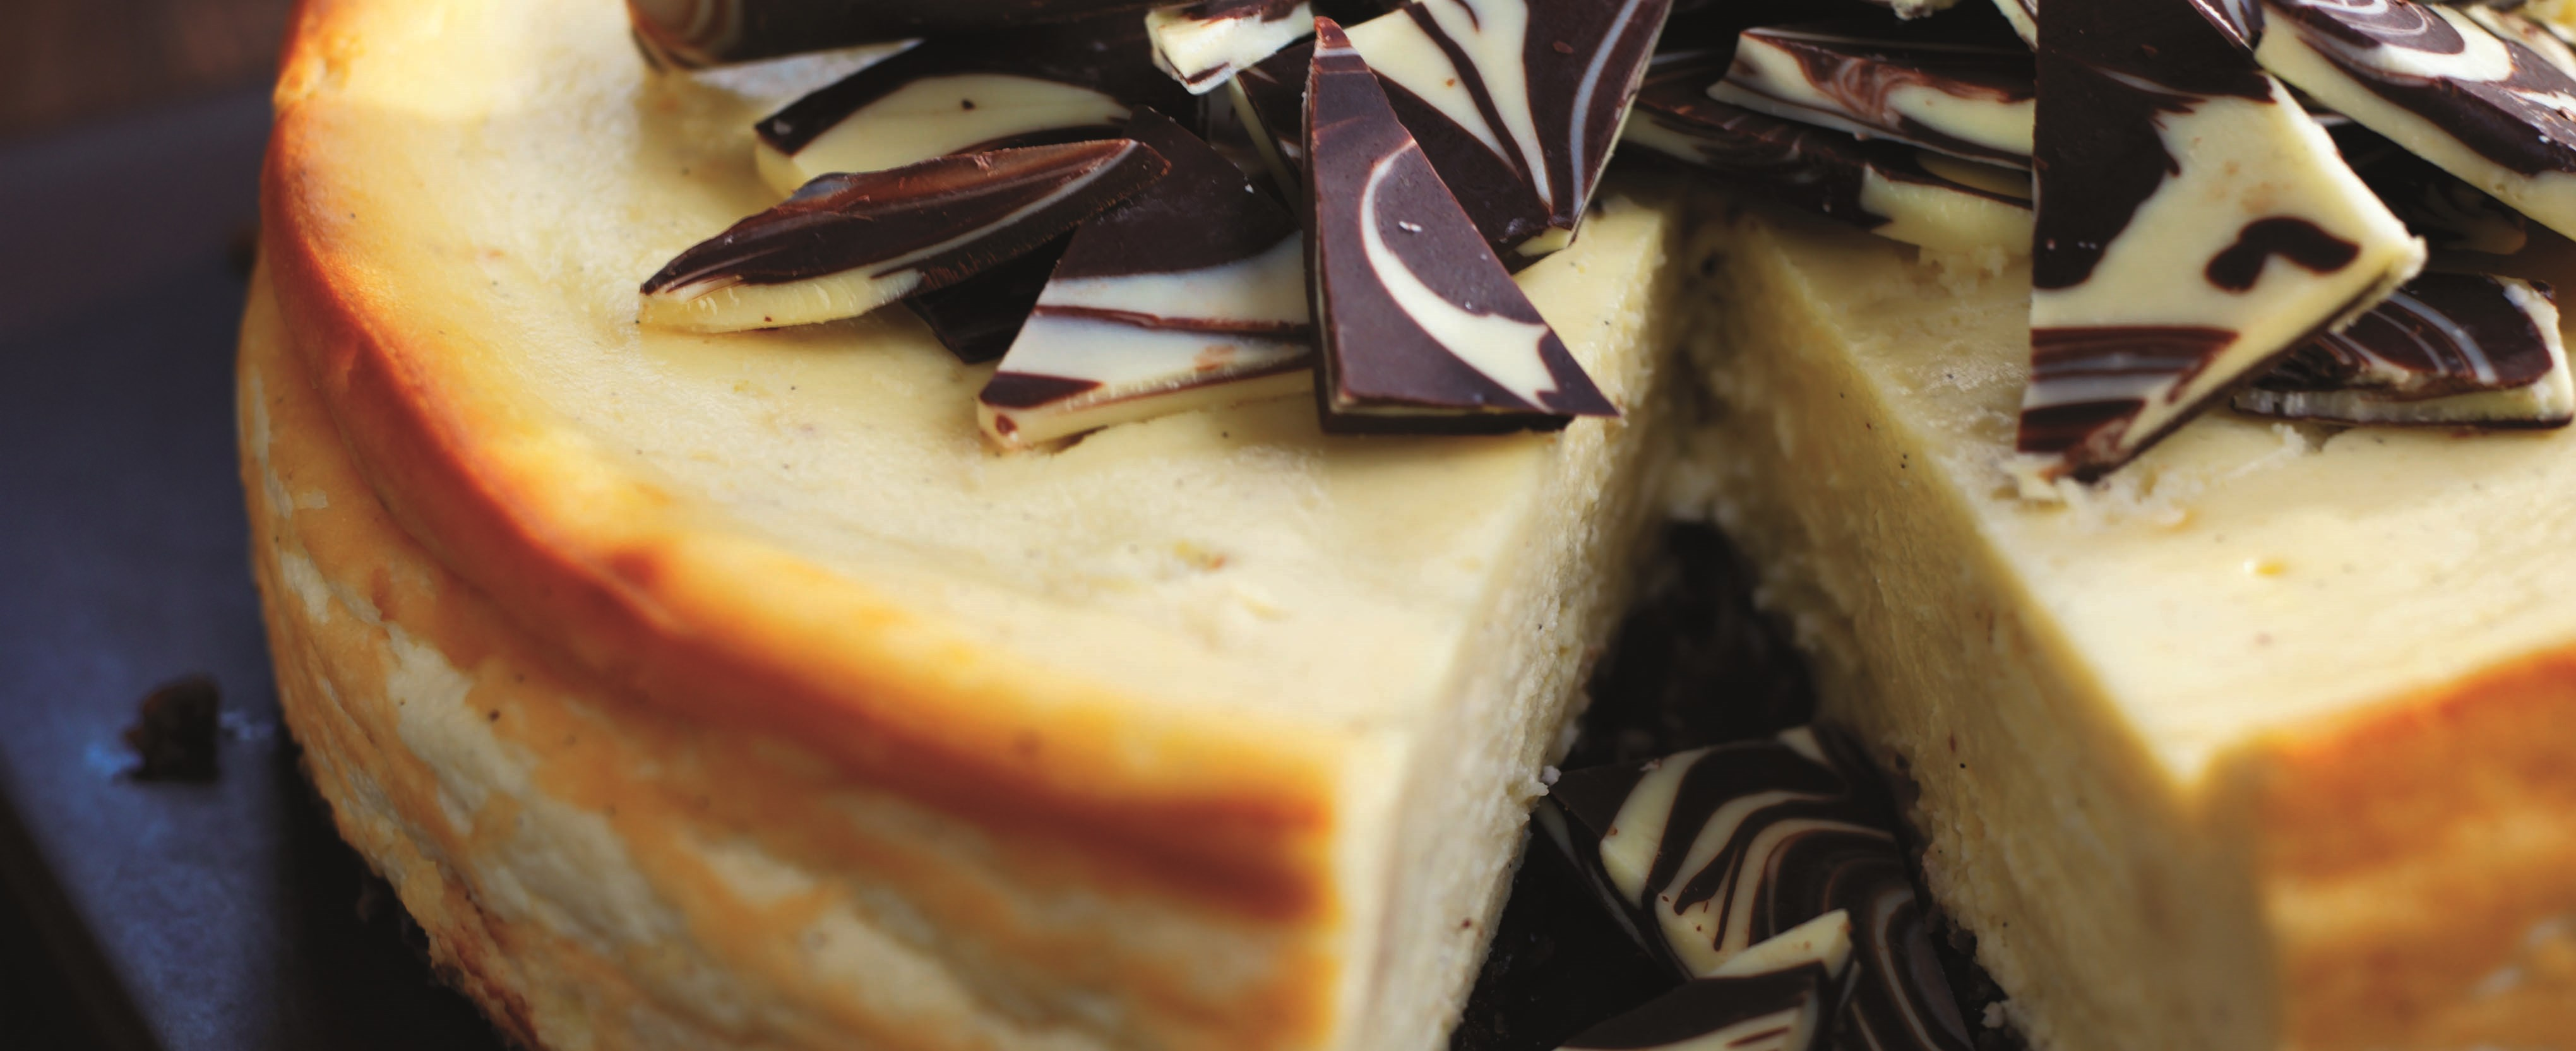 White chocolate and Baileys cheesecake